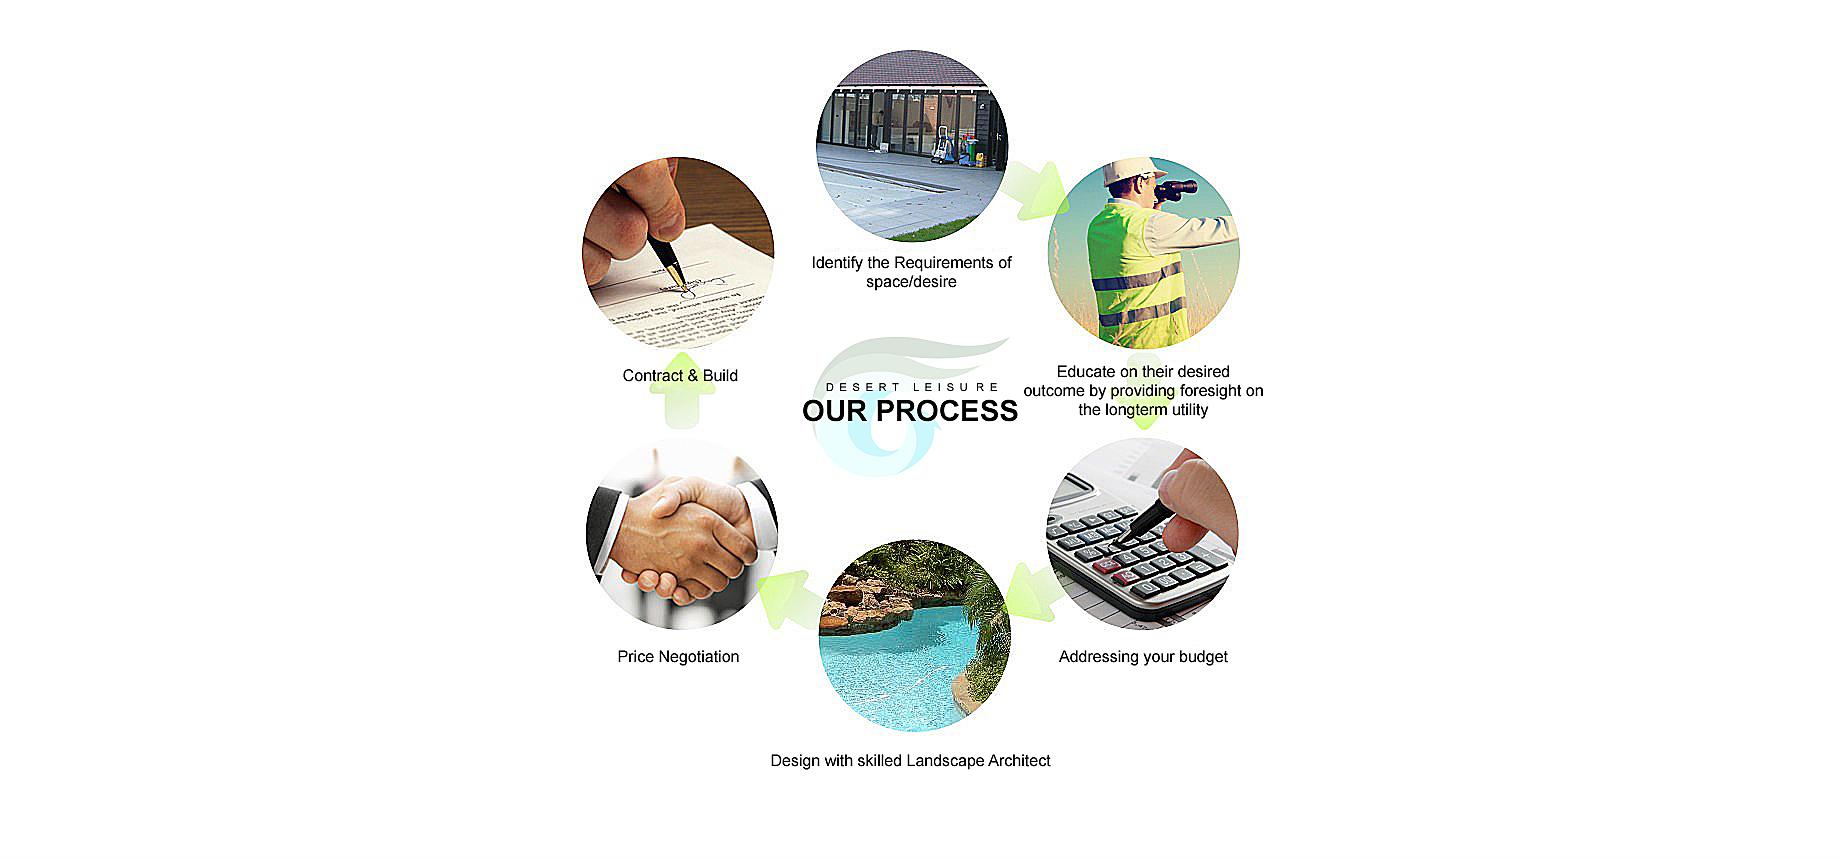 Our-Process-Chart-desert-leisure